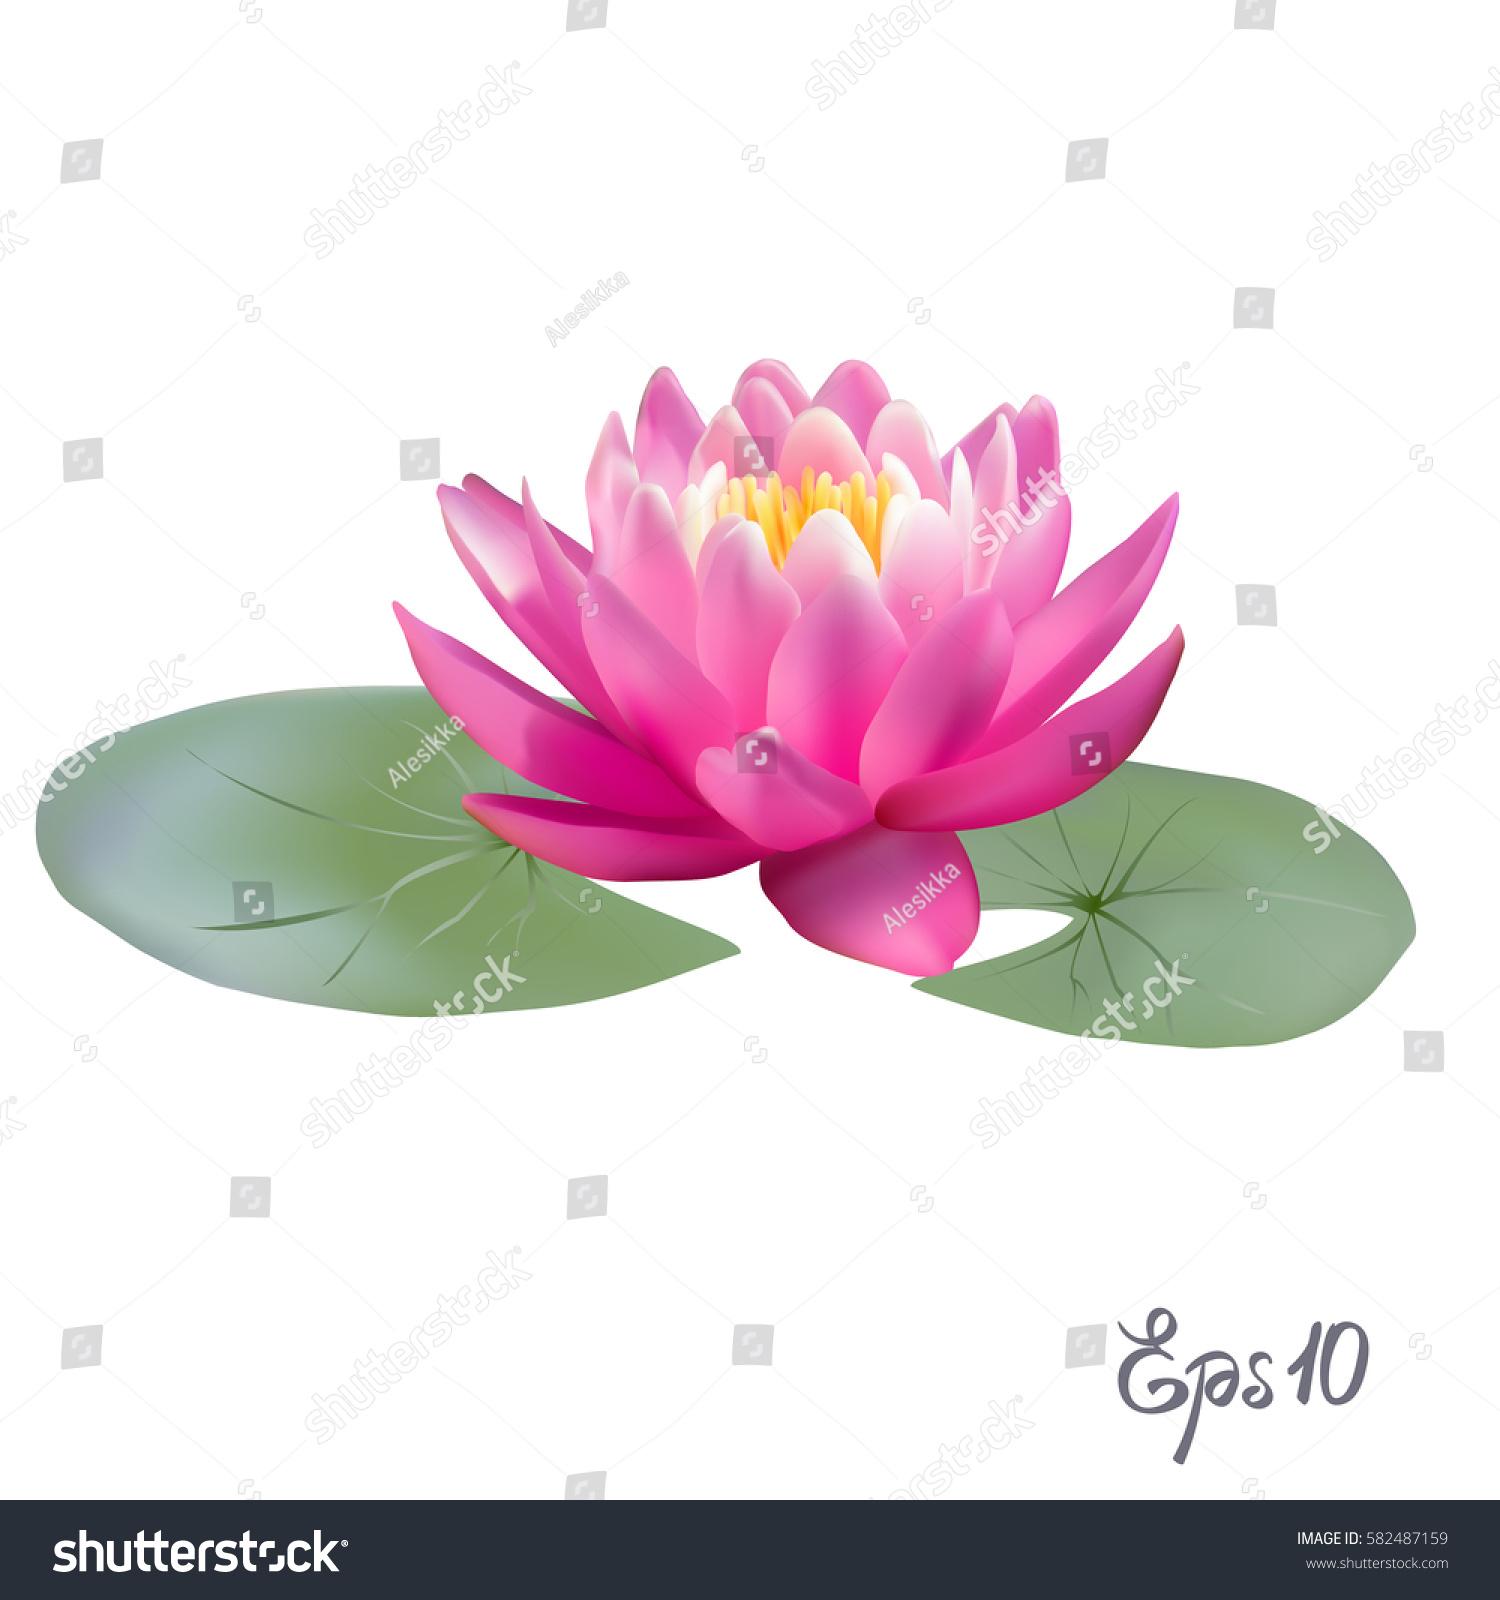 Beautiful lily lotus beautiful realistic illustration stock vector beautiful lily lotus a beautiful realistic illustration of a lily or lotus and lily isolated izmirmasajfo